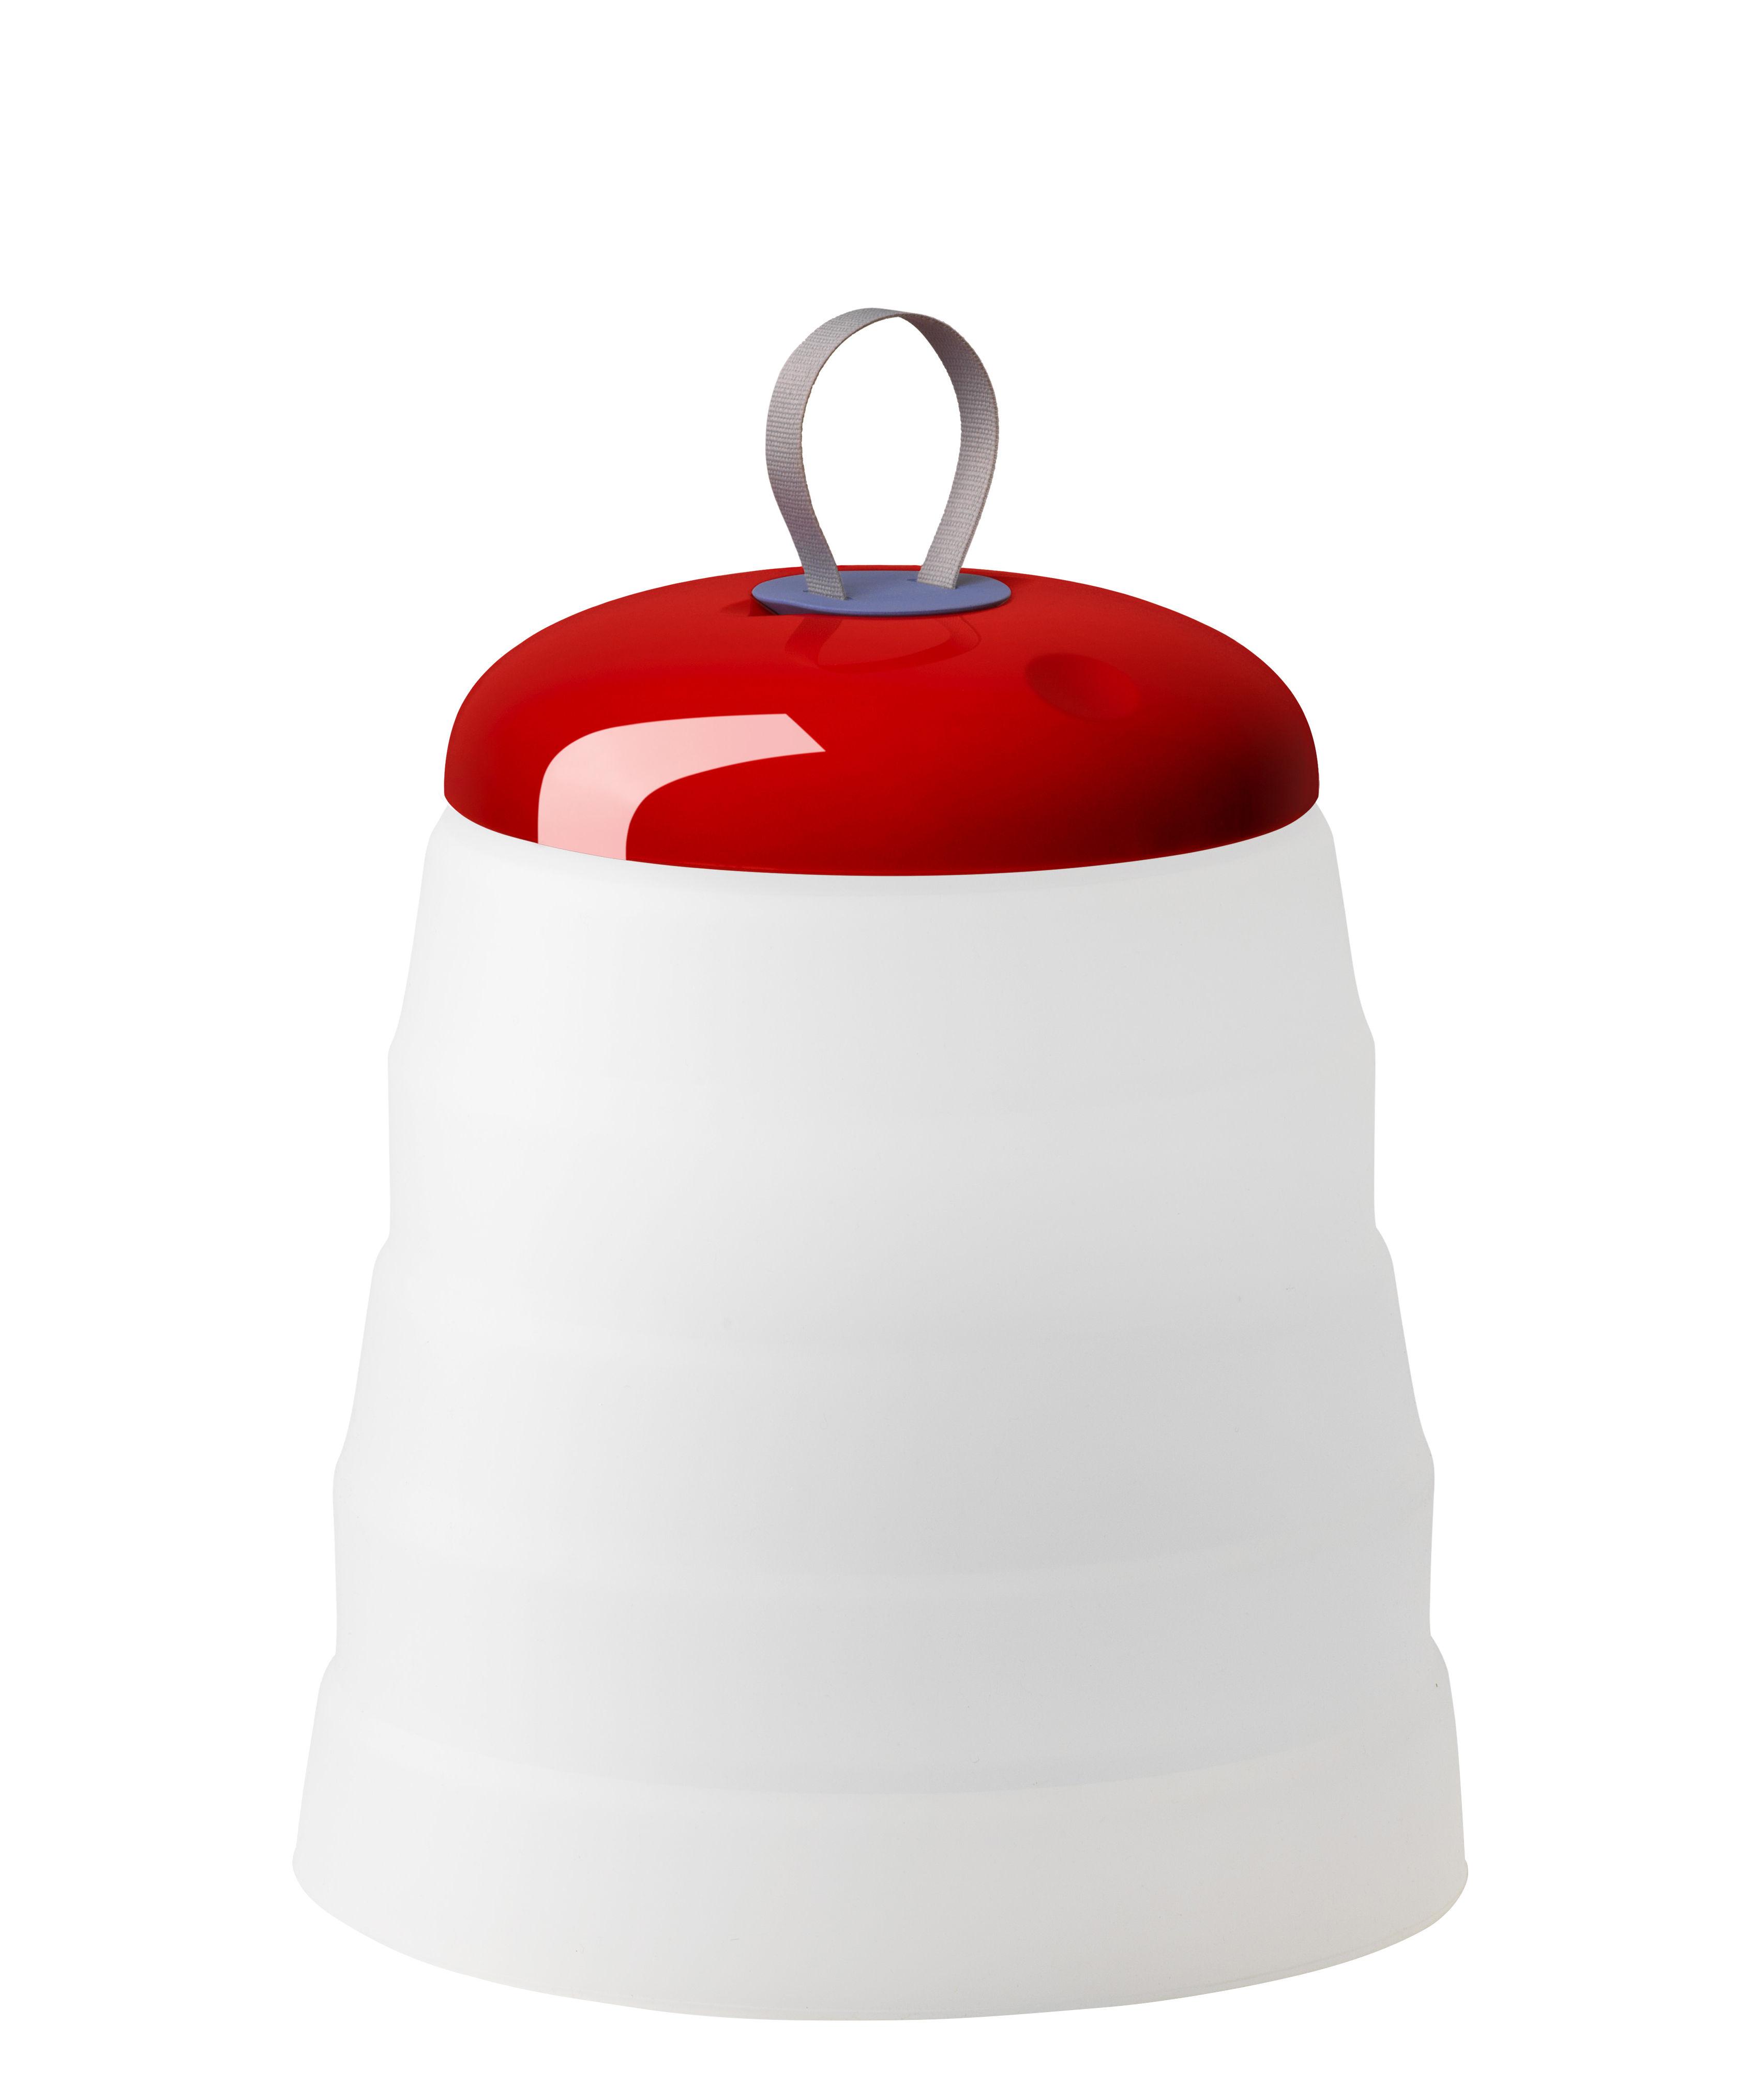 Luminaire - Lampes de table - Lampe sans fil Cri Cri LED Outdoor / H 31 cm - Recharge USB - Foscarini - Rouge - ABS, PMMA, Silicone